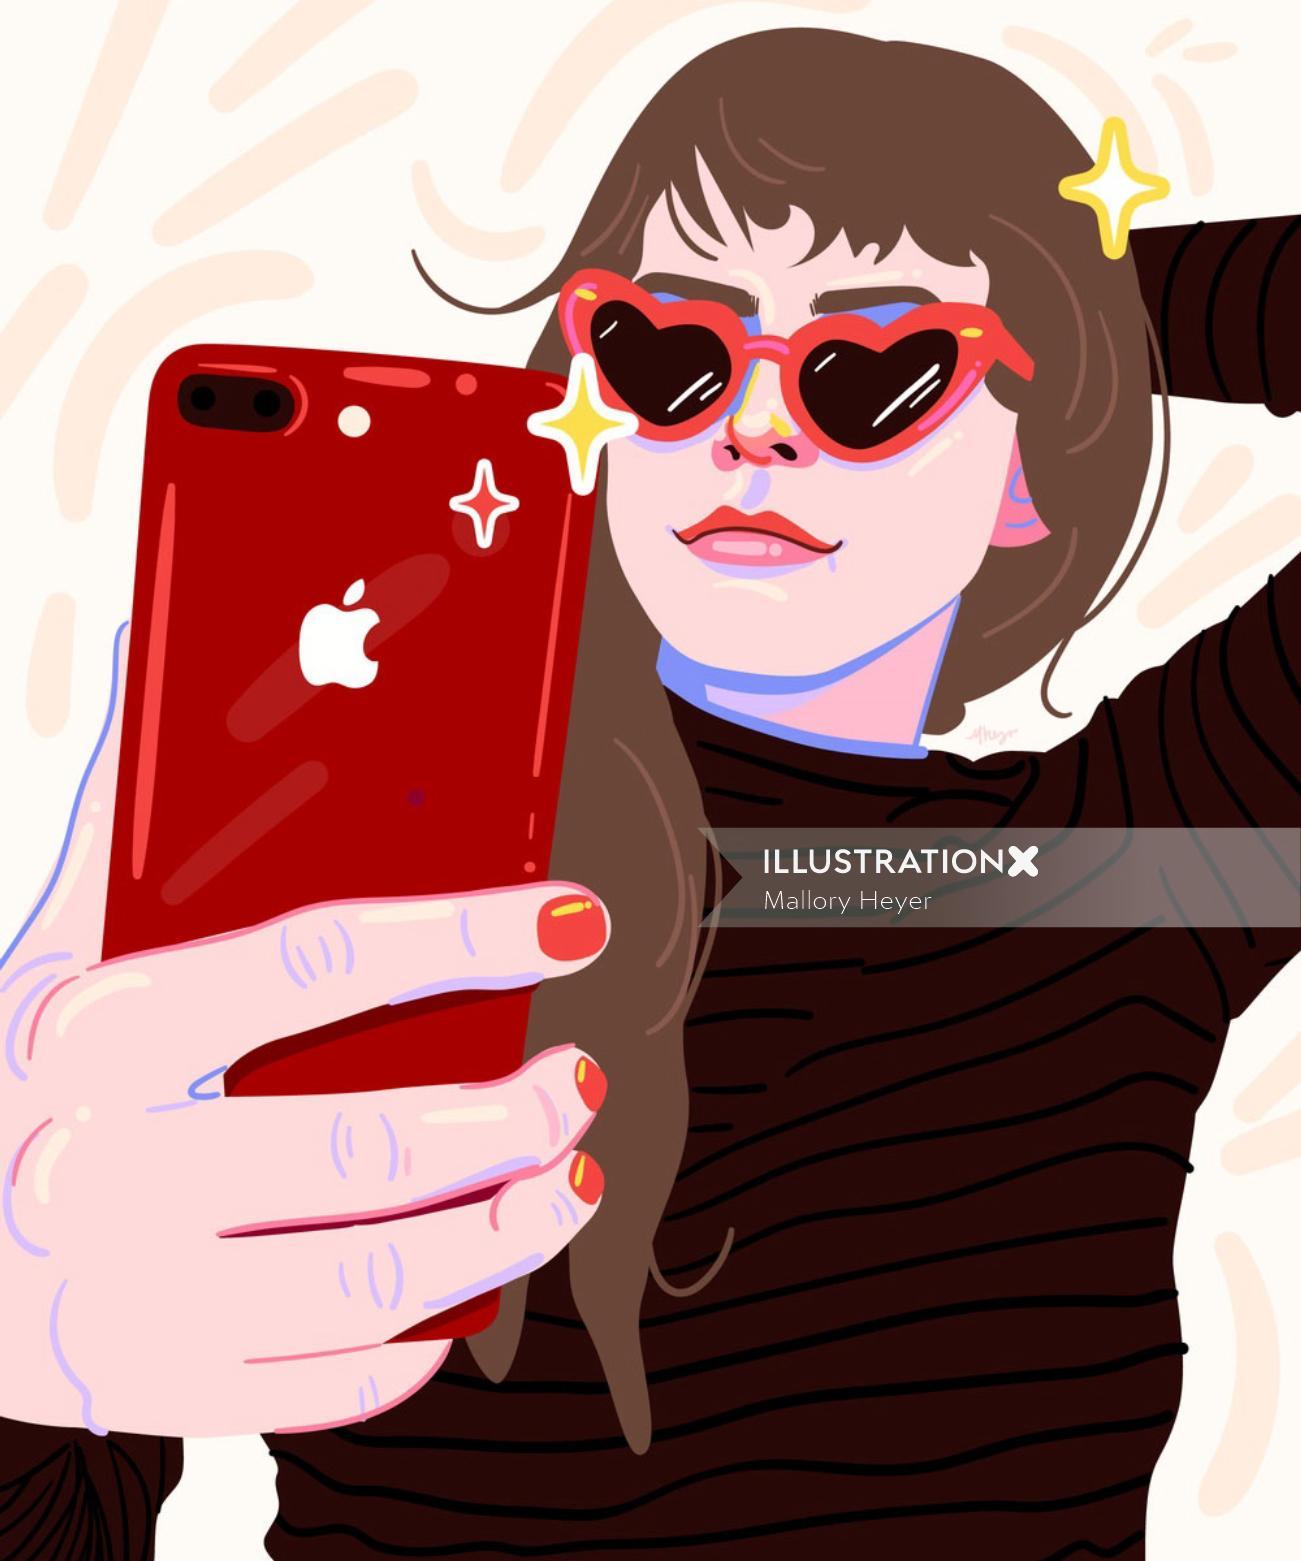 Illustration for (RED)'s social media accounts